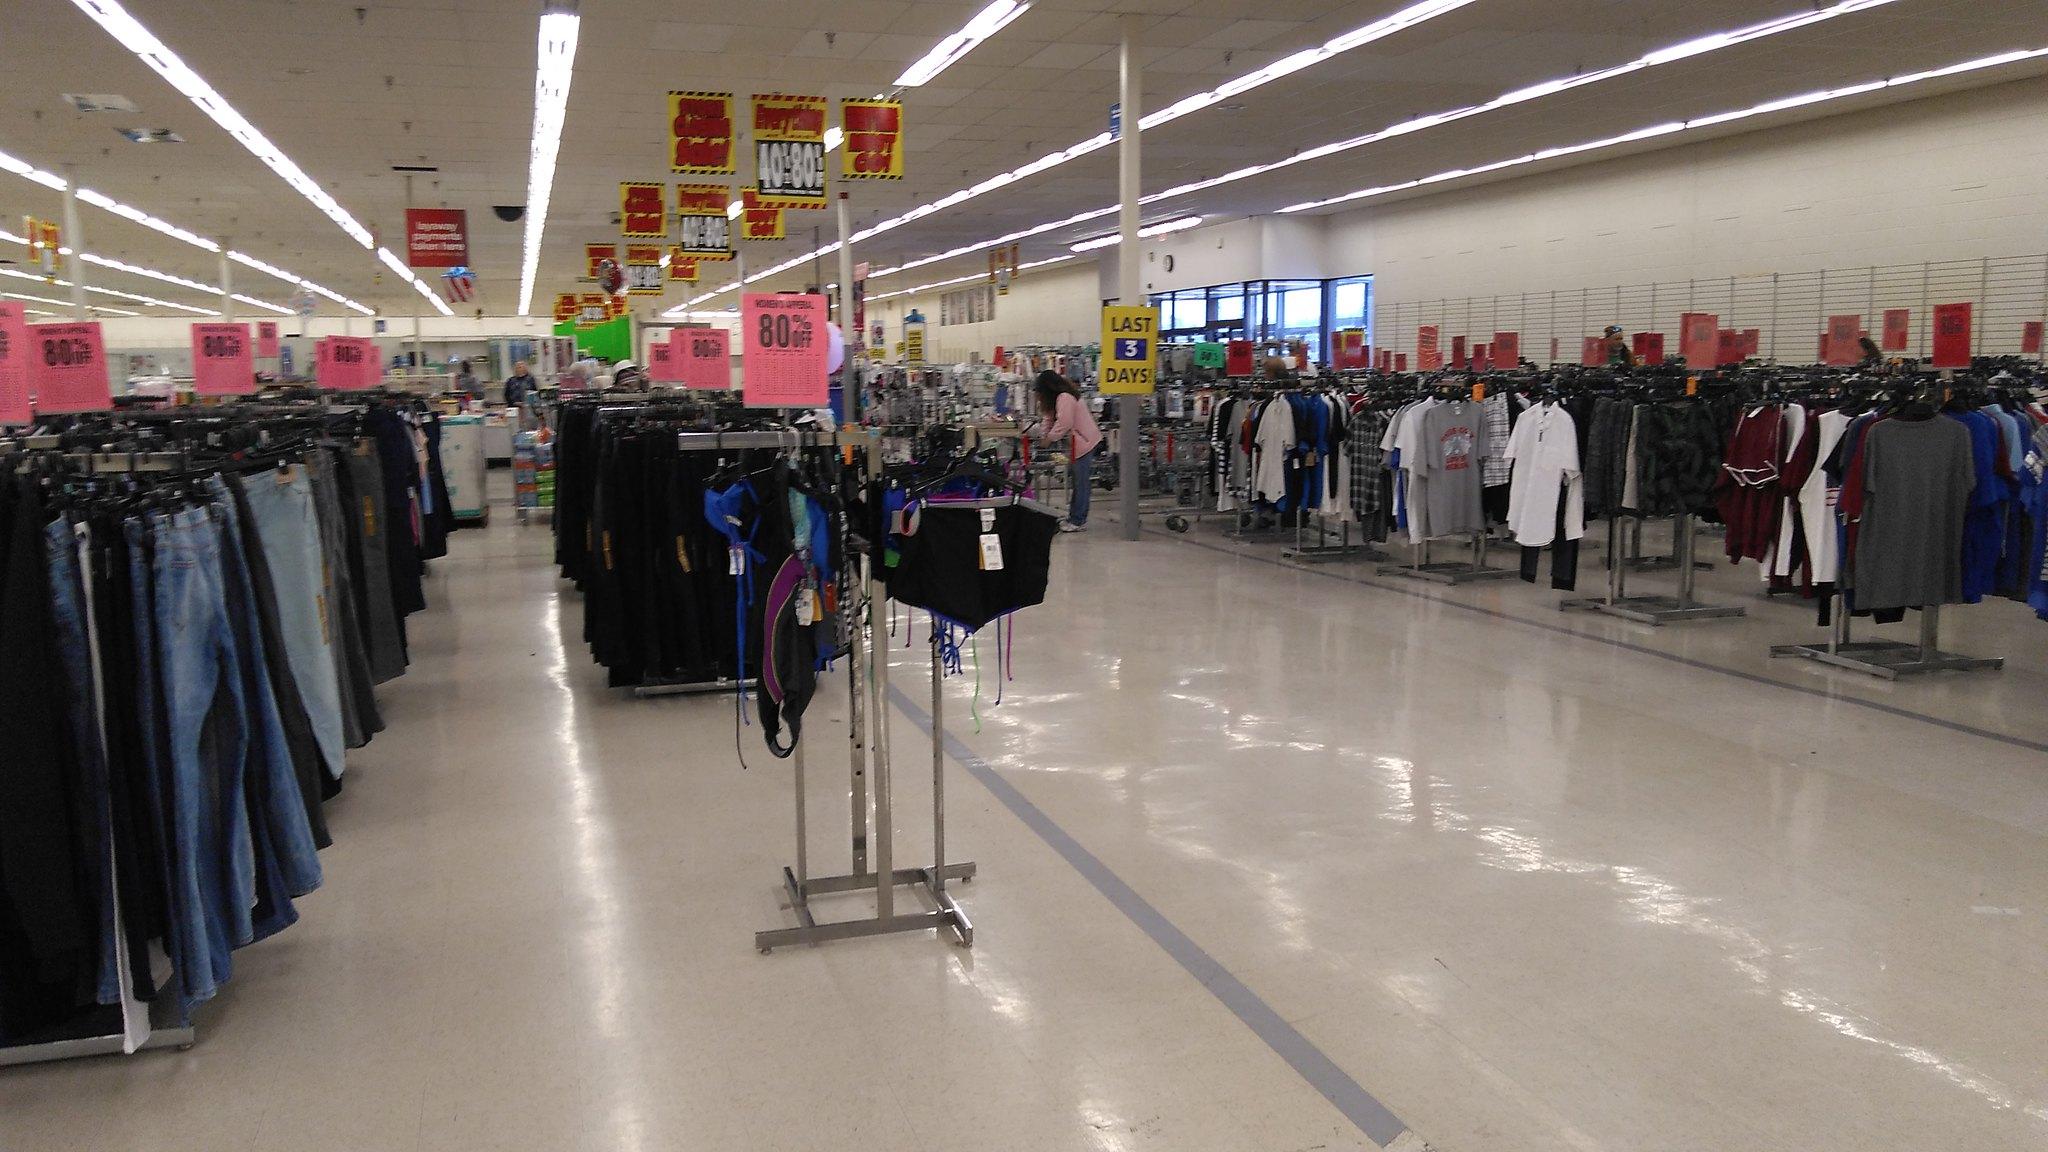 Kmart -- Wytheville, VA